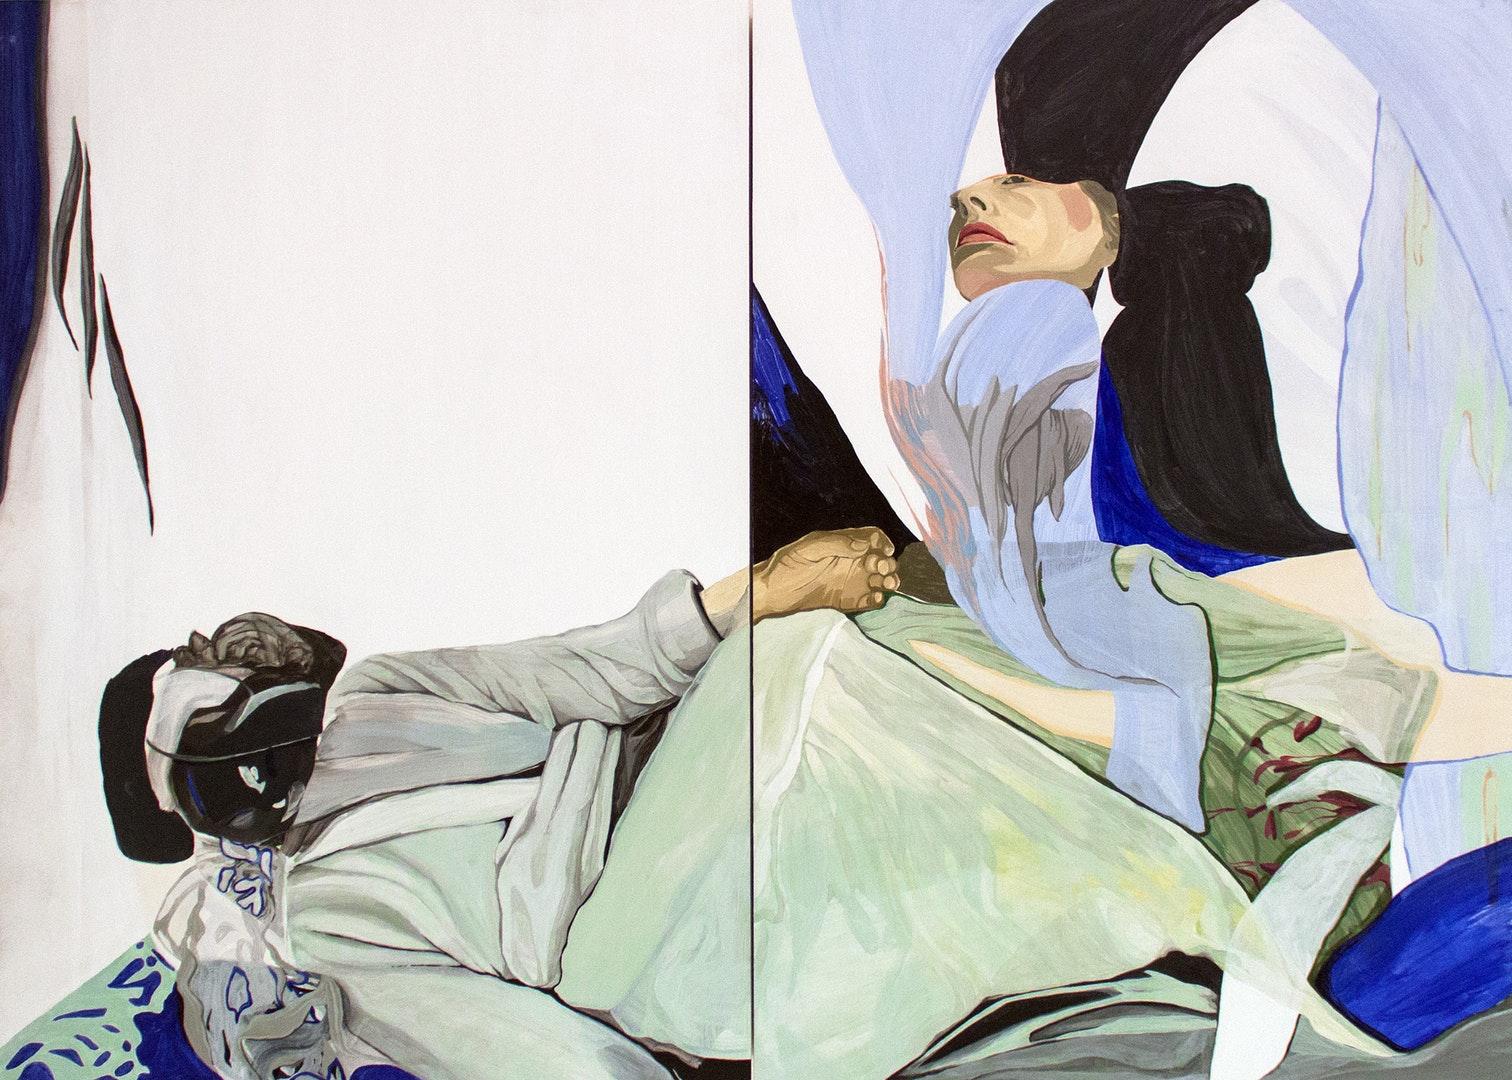 Magdalena Gluszak - Holeksa  Between Man and Man  Oil on board, 61 x 85 x 4.4 cm  http://www.magdalenagluszak.com